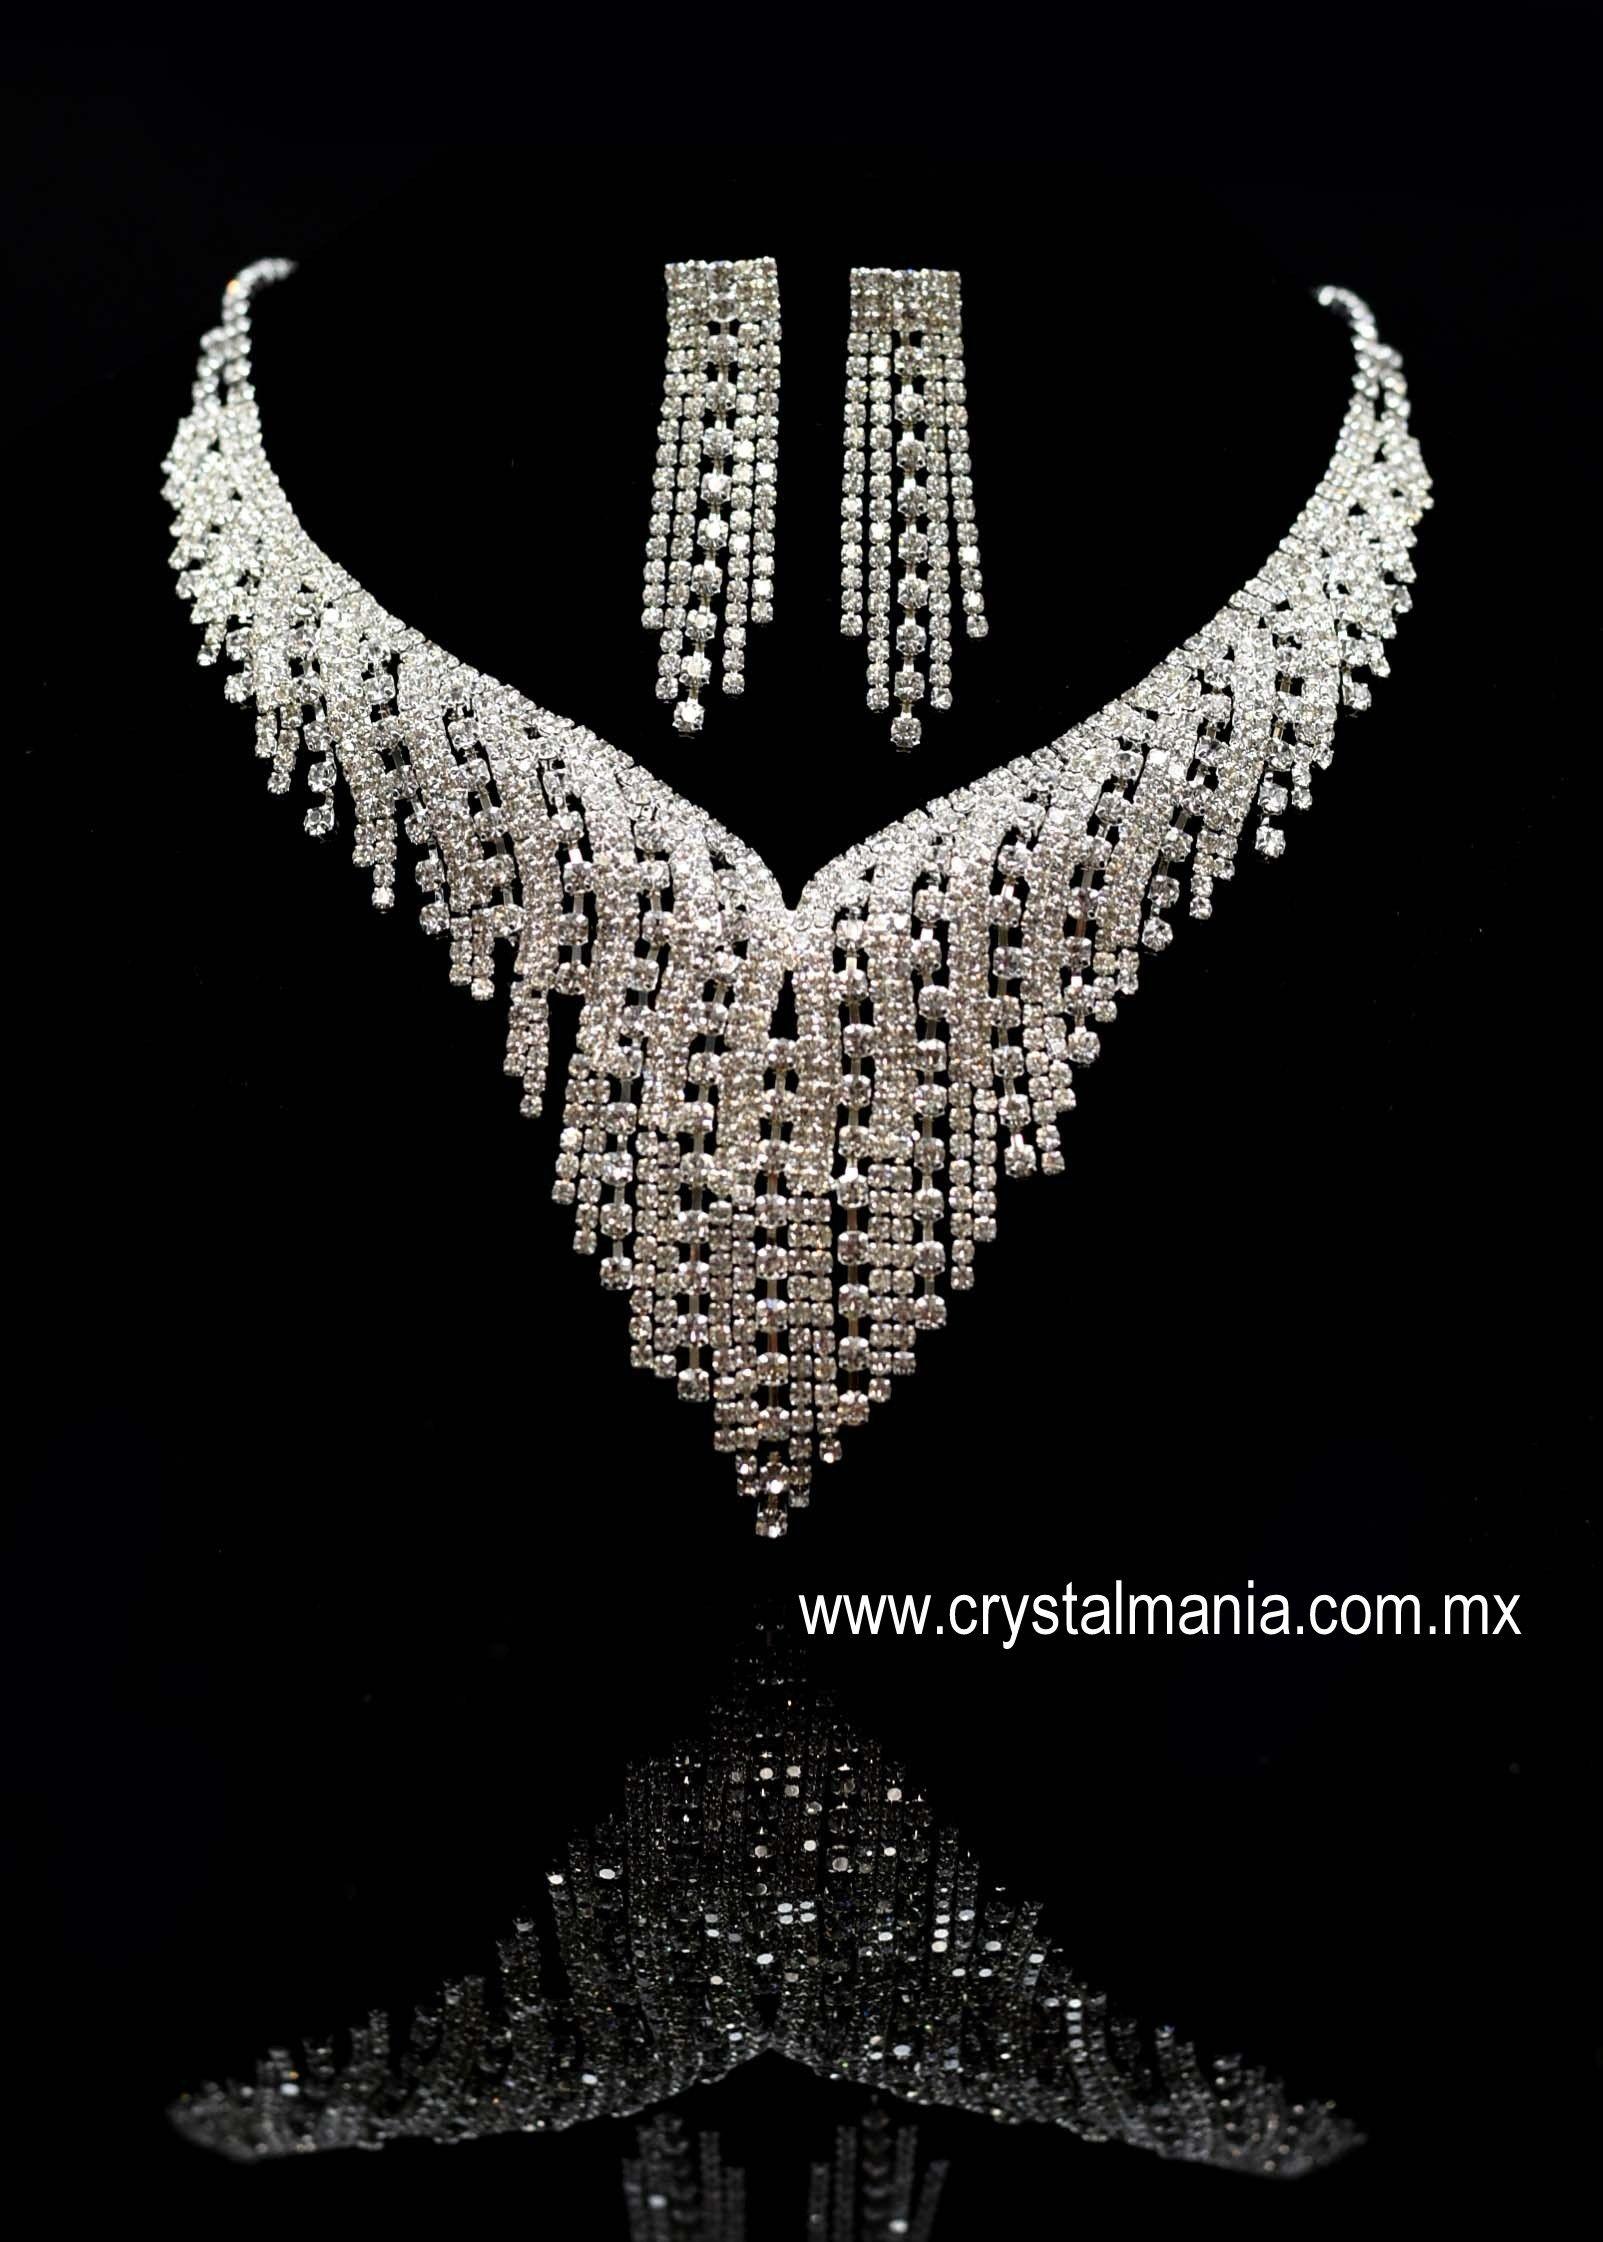 eb43aed575db Collares cristal collares pedreria collares con perlas collares moda ...